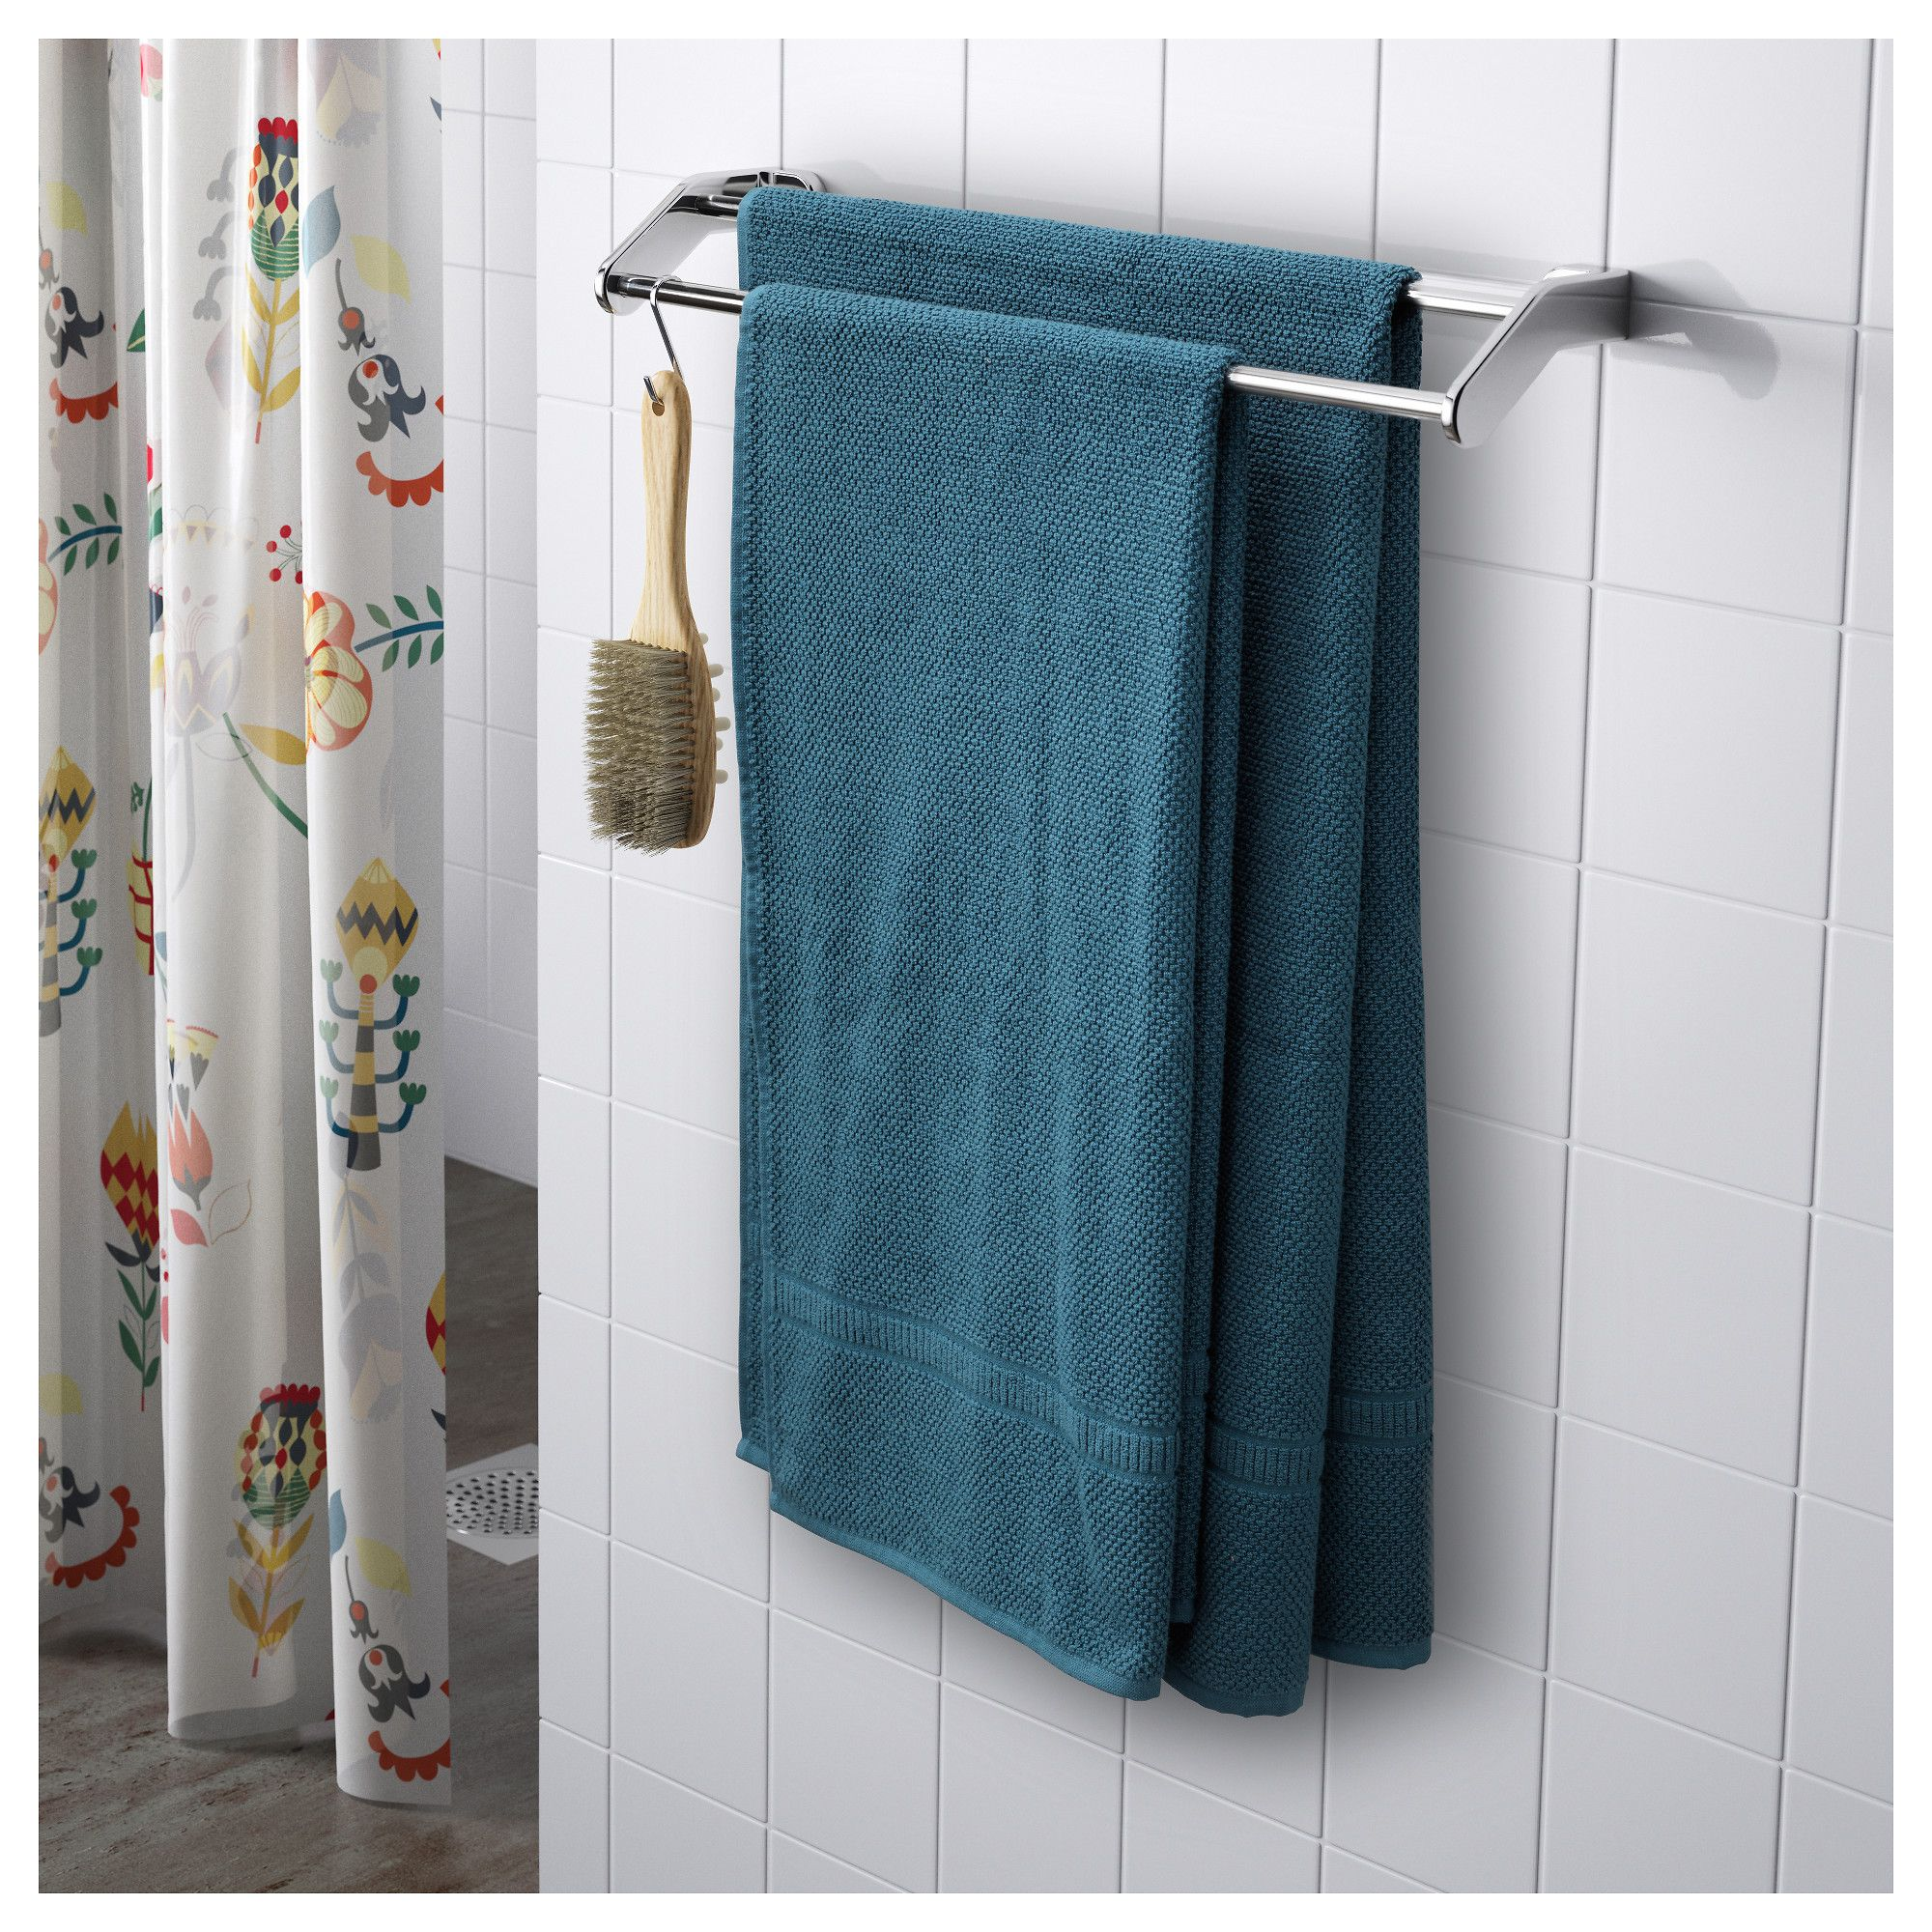 ikea fr jen serviette de bain bleu vert in 2019. Black Bedroom Furniture Sets. Home Design Ideas